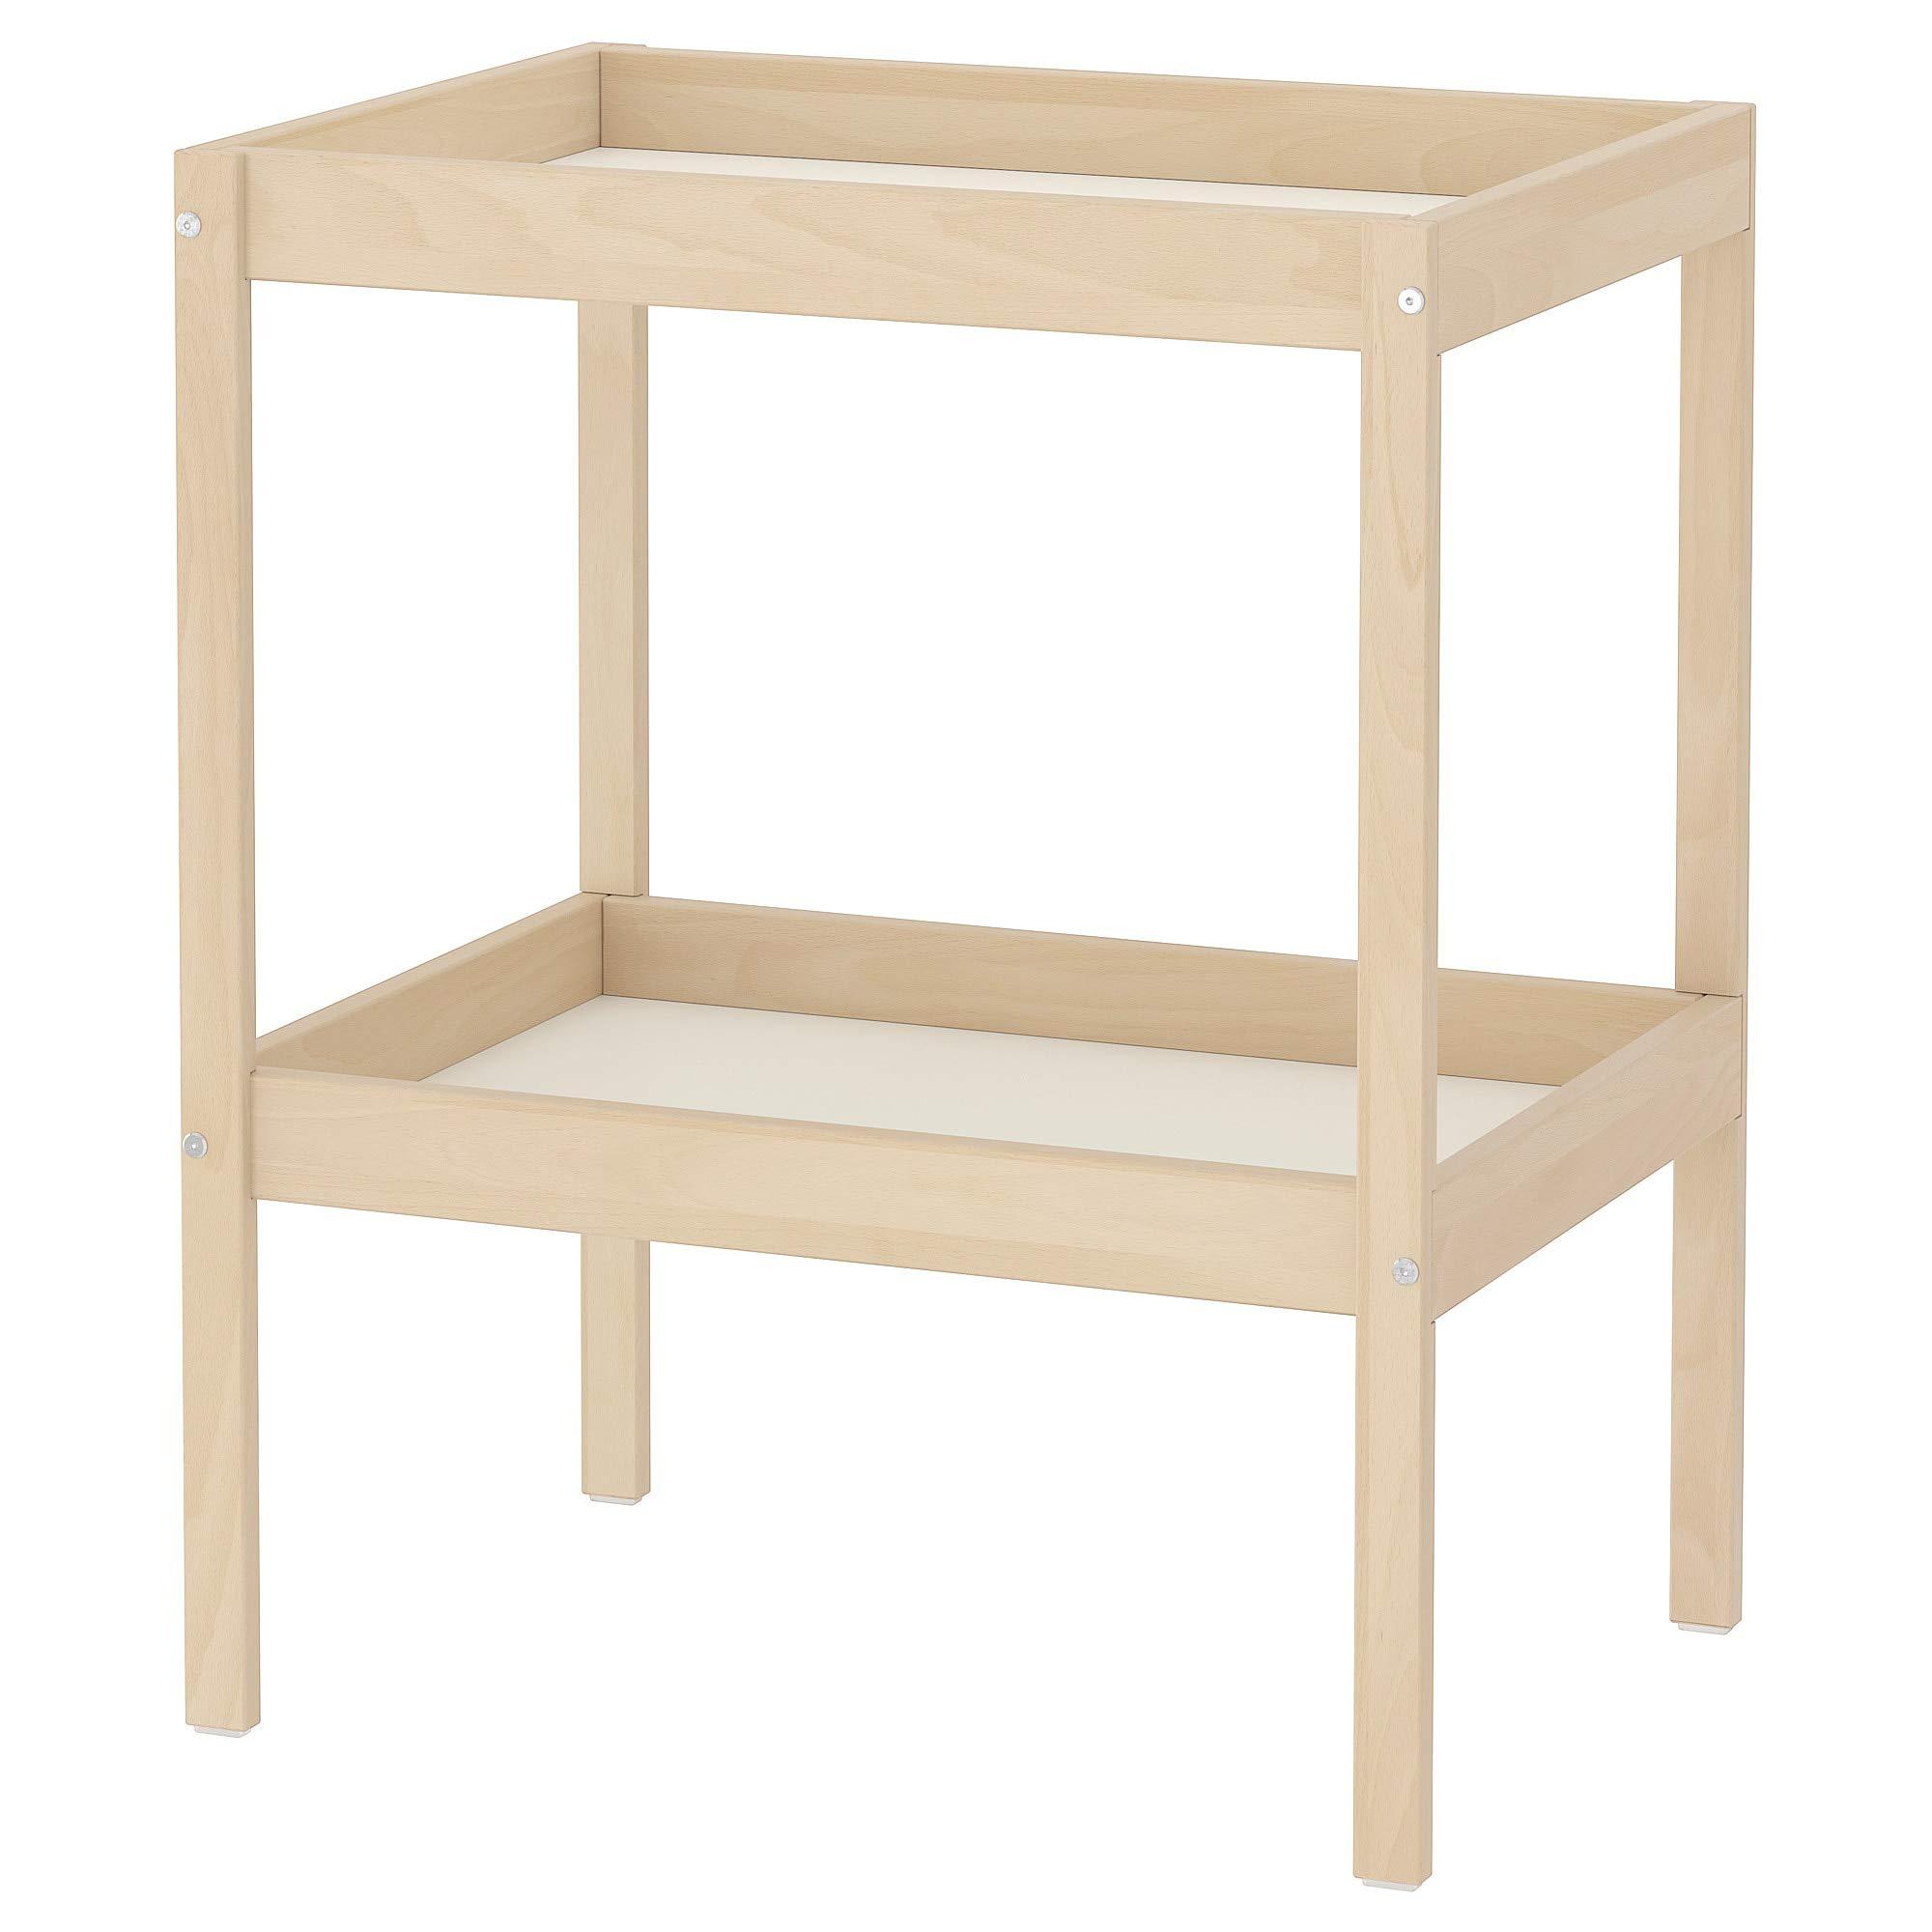 IKEA.. 501.975.89 Sniglar Changing Table, Beech, White